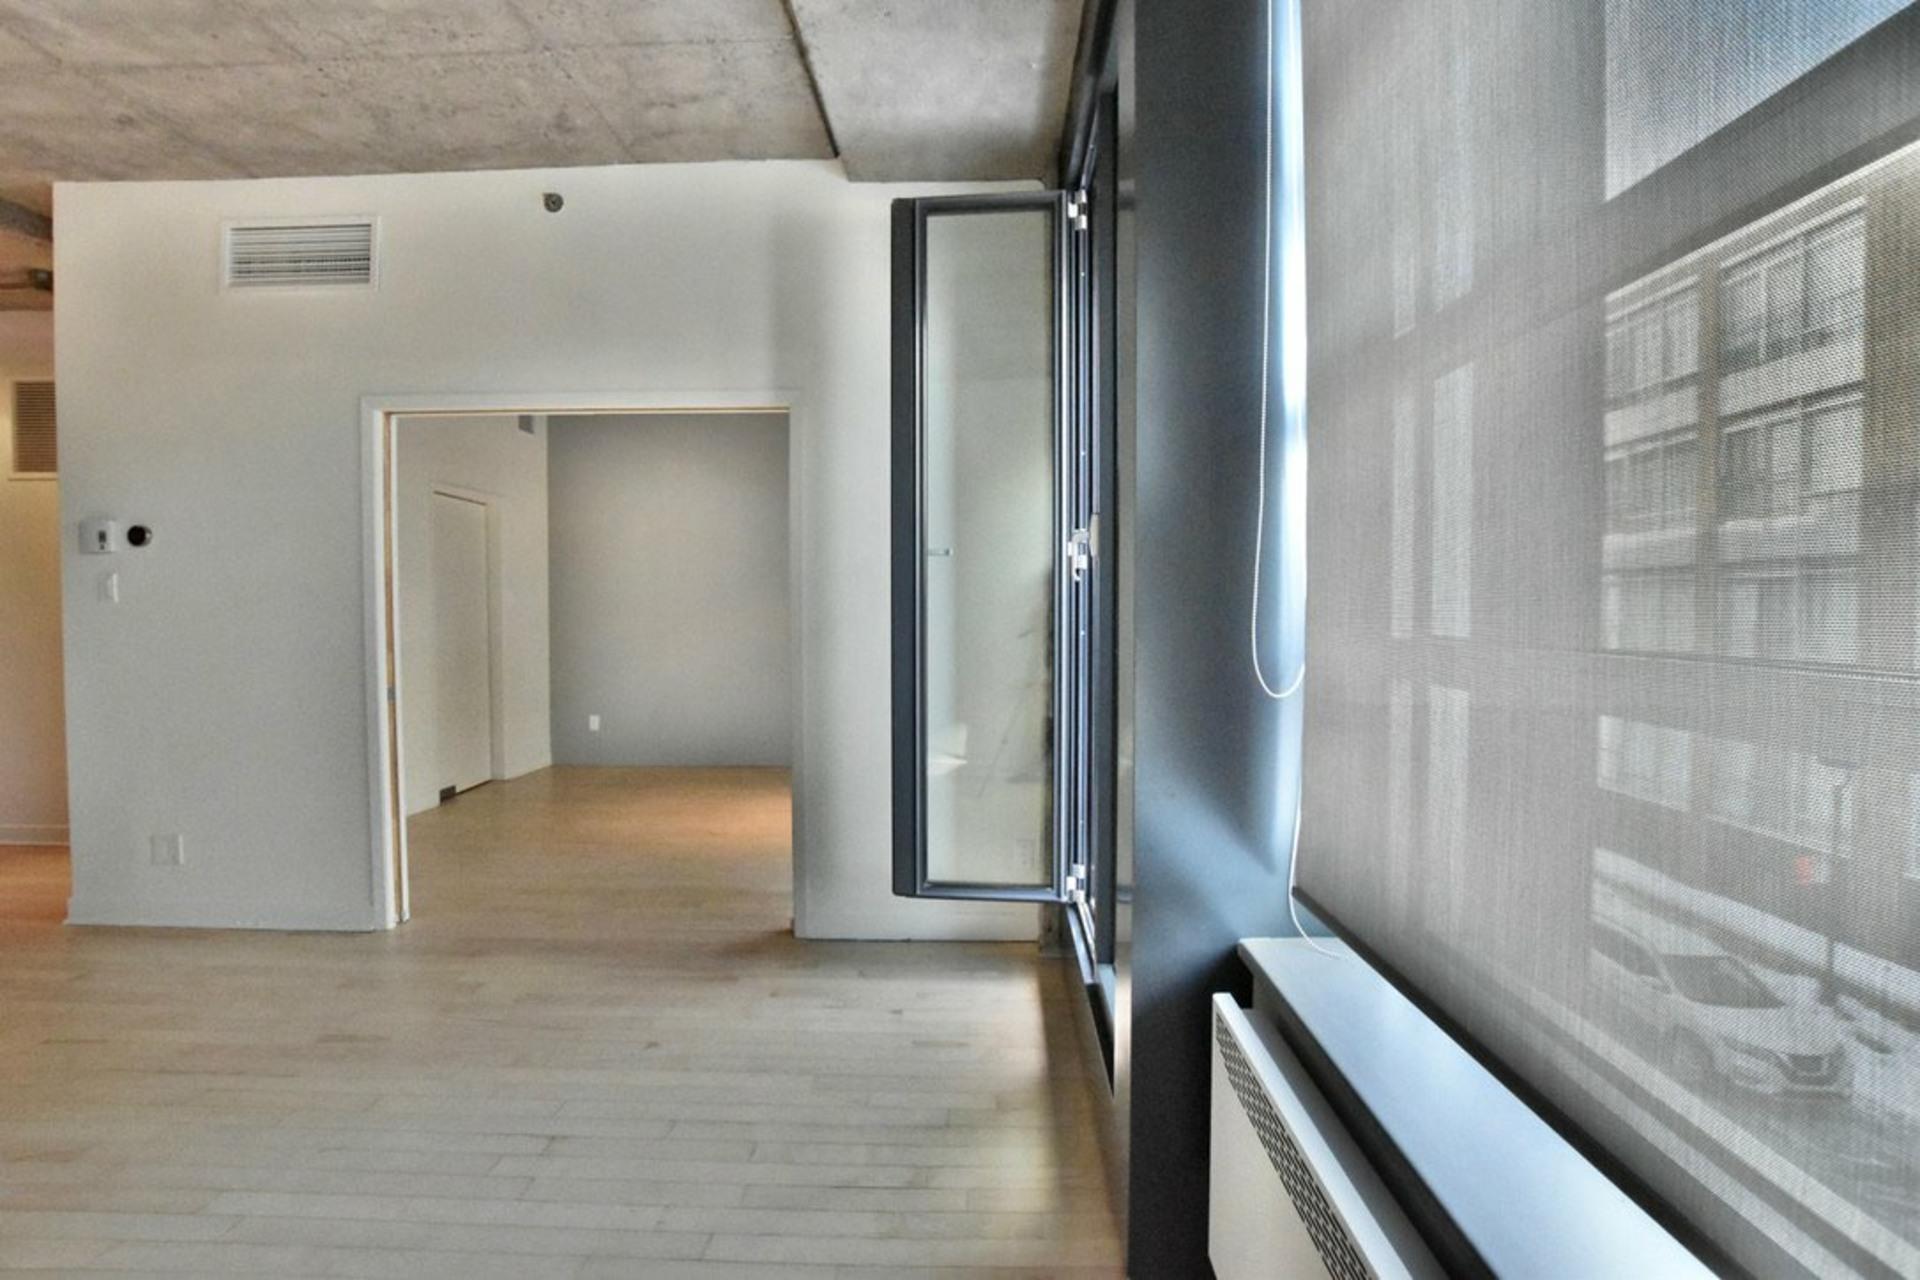 image 17 - Departamento Para alquiler Villeray/Saint-Michel/Parc-Extension Montréal  - 3 habitaciones